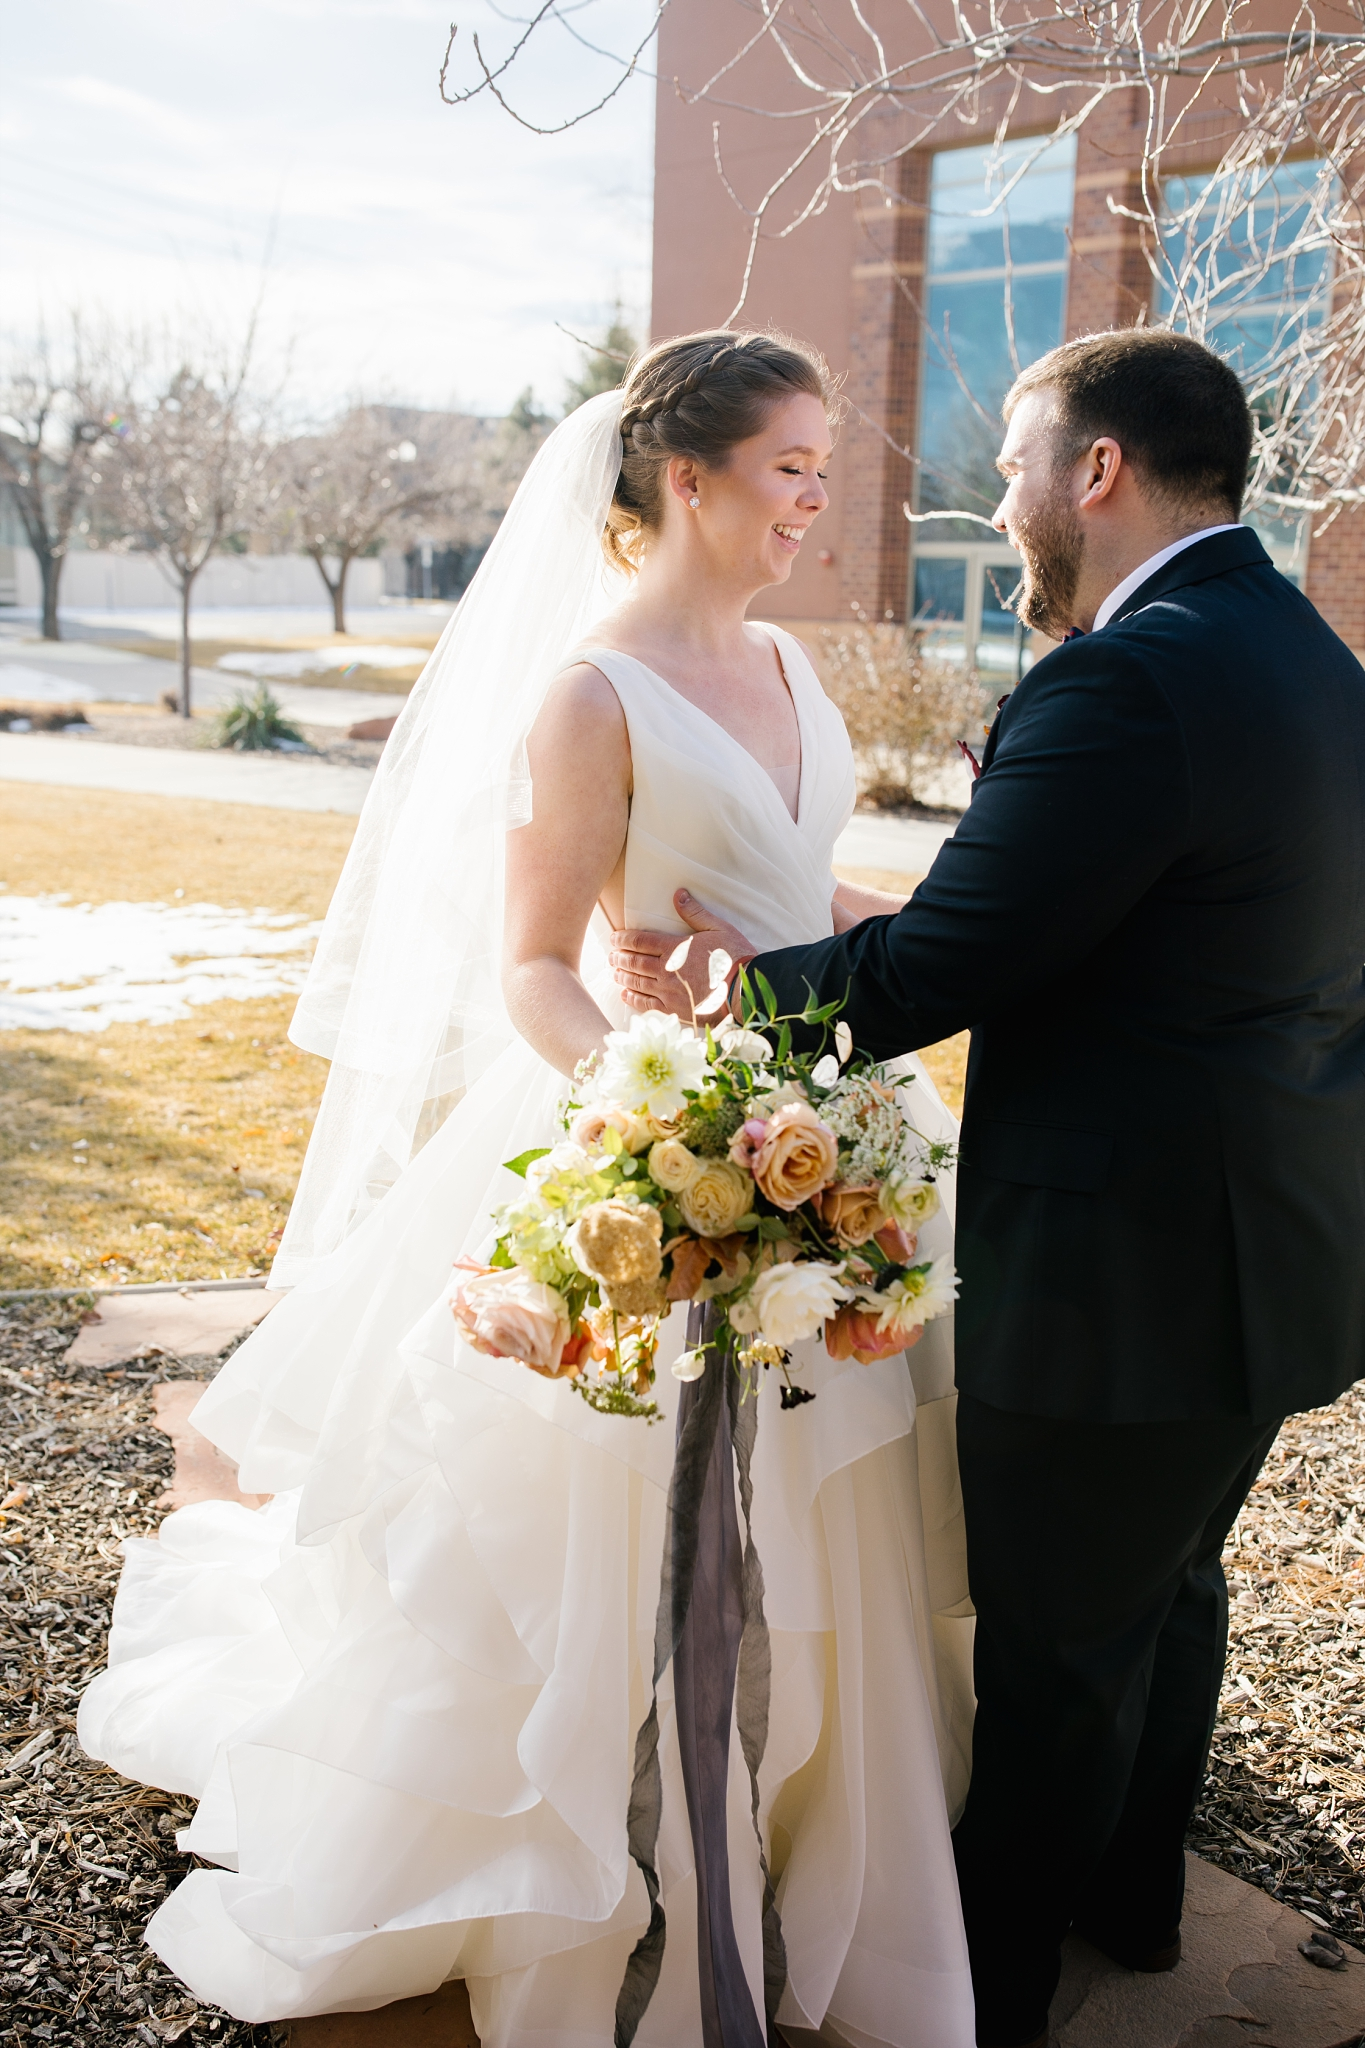 CN-Wedding-39_Lizzie-B-Imagery-Utah-Wedding-Photographer-Blessed-Sacrament-Catholic-Church-Sandy-Utah-The-Blended-Table-Salt-Lake-City.jpg